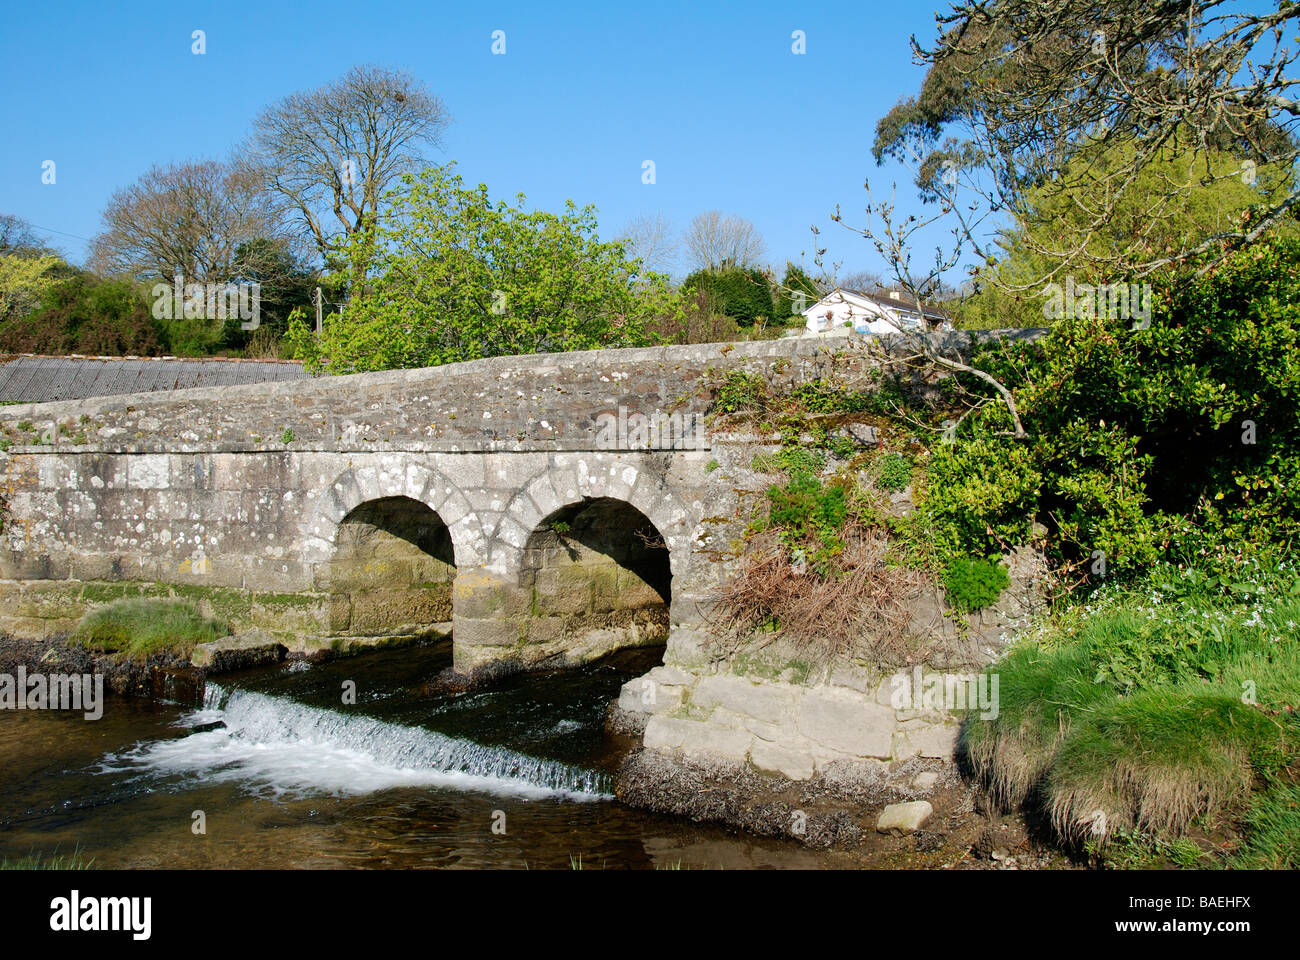 the old granite bridge at gweek near helston in cornwall,uk - Stock Image